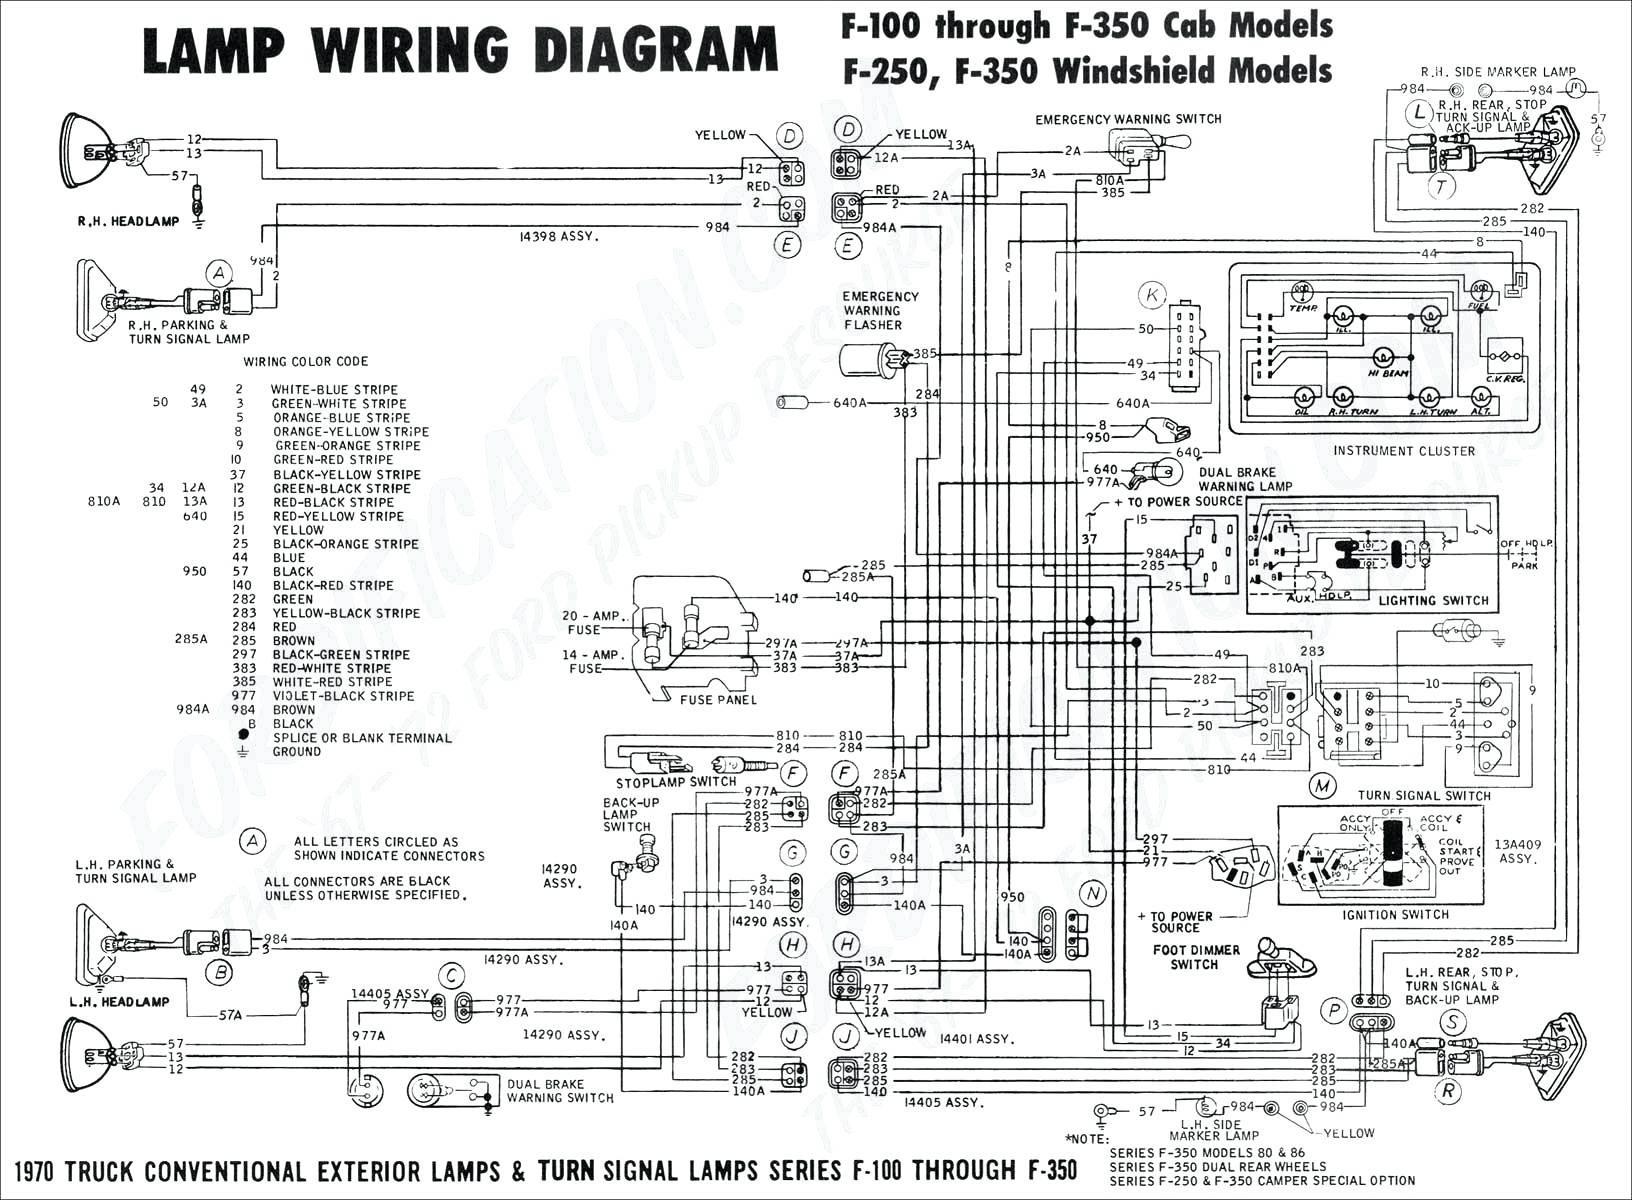 ford f250 wiring diagram wiring diagram trailer lights ireland valid ford f250 wiring diagram for trailer lights copy pioneer fh 2h